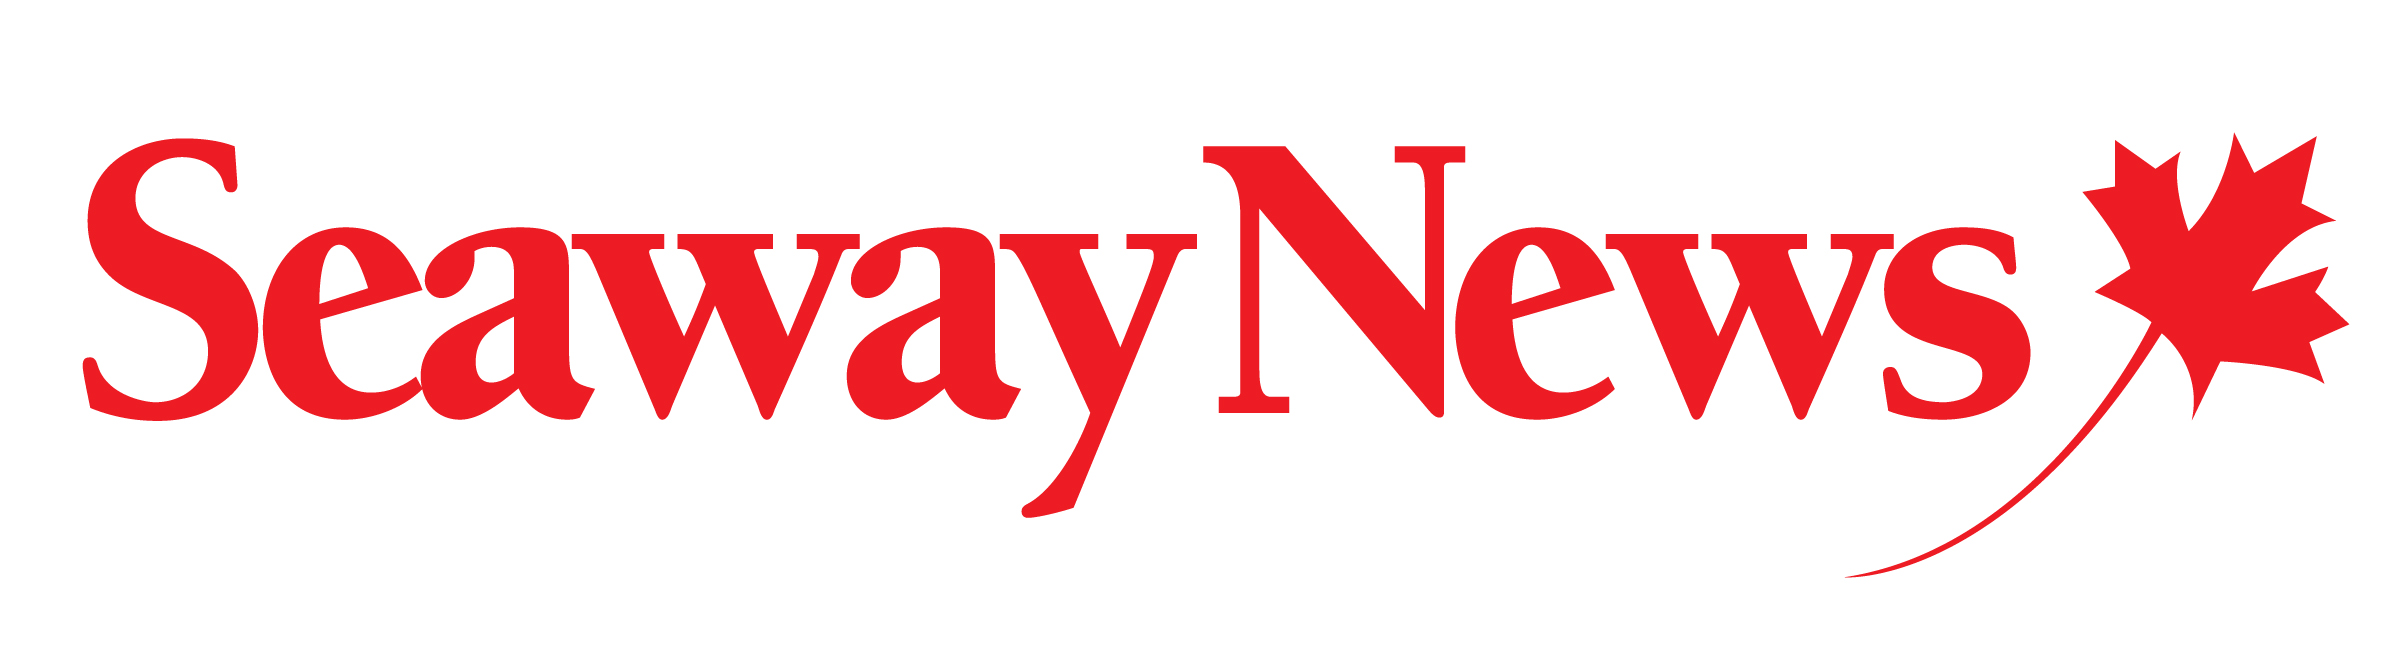 Cornwall Seaway News